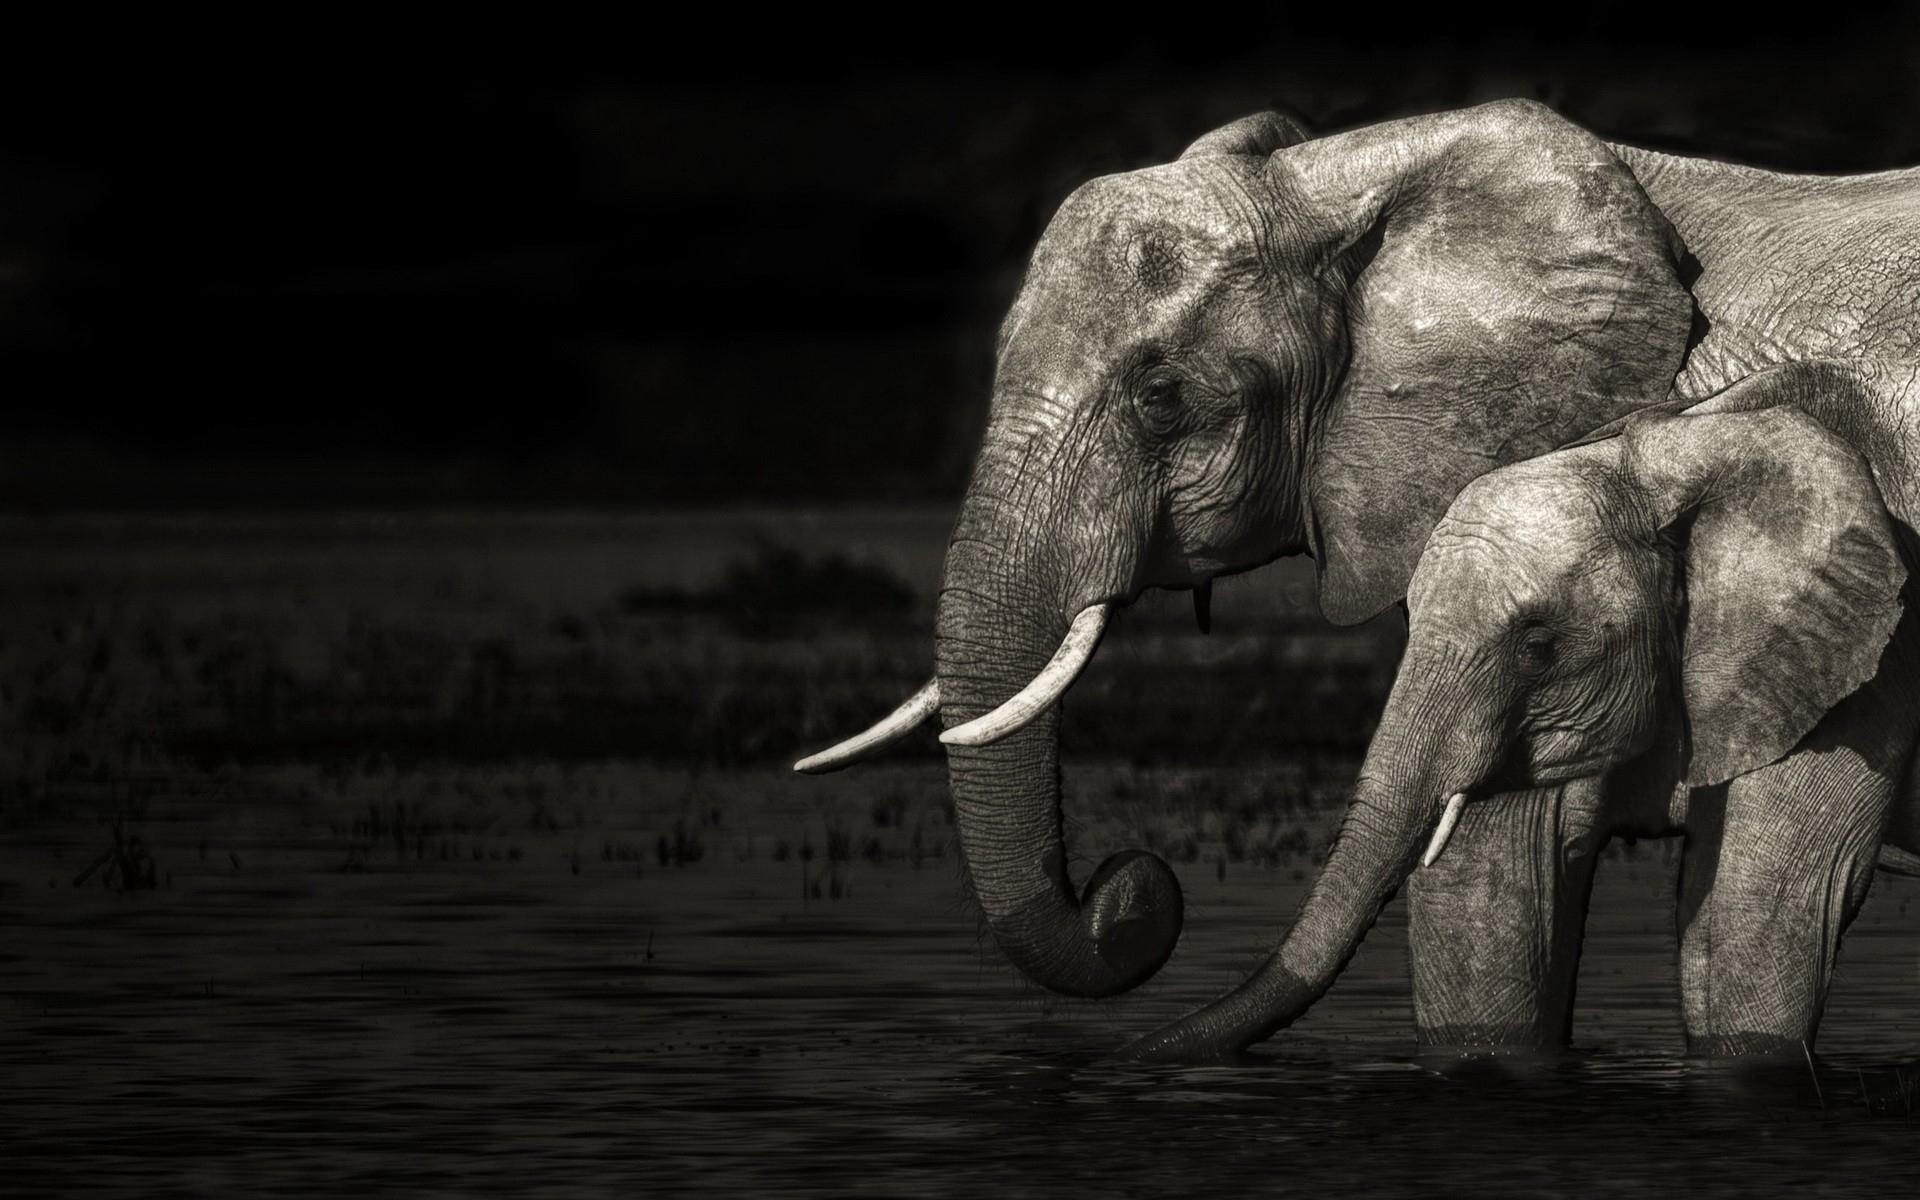 Fond D Ecran Monochrome Eau Faune Bebe Elephant